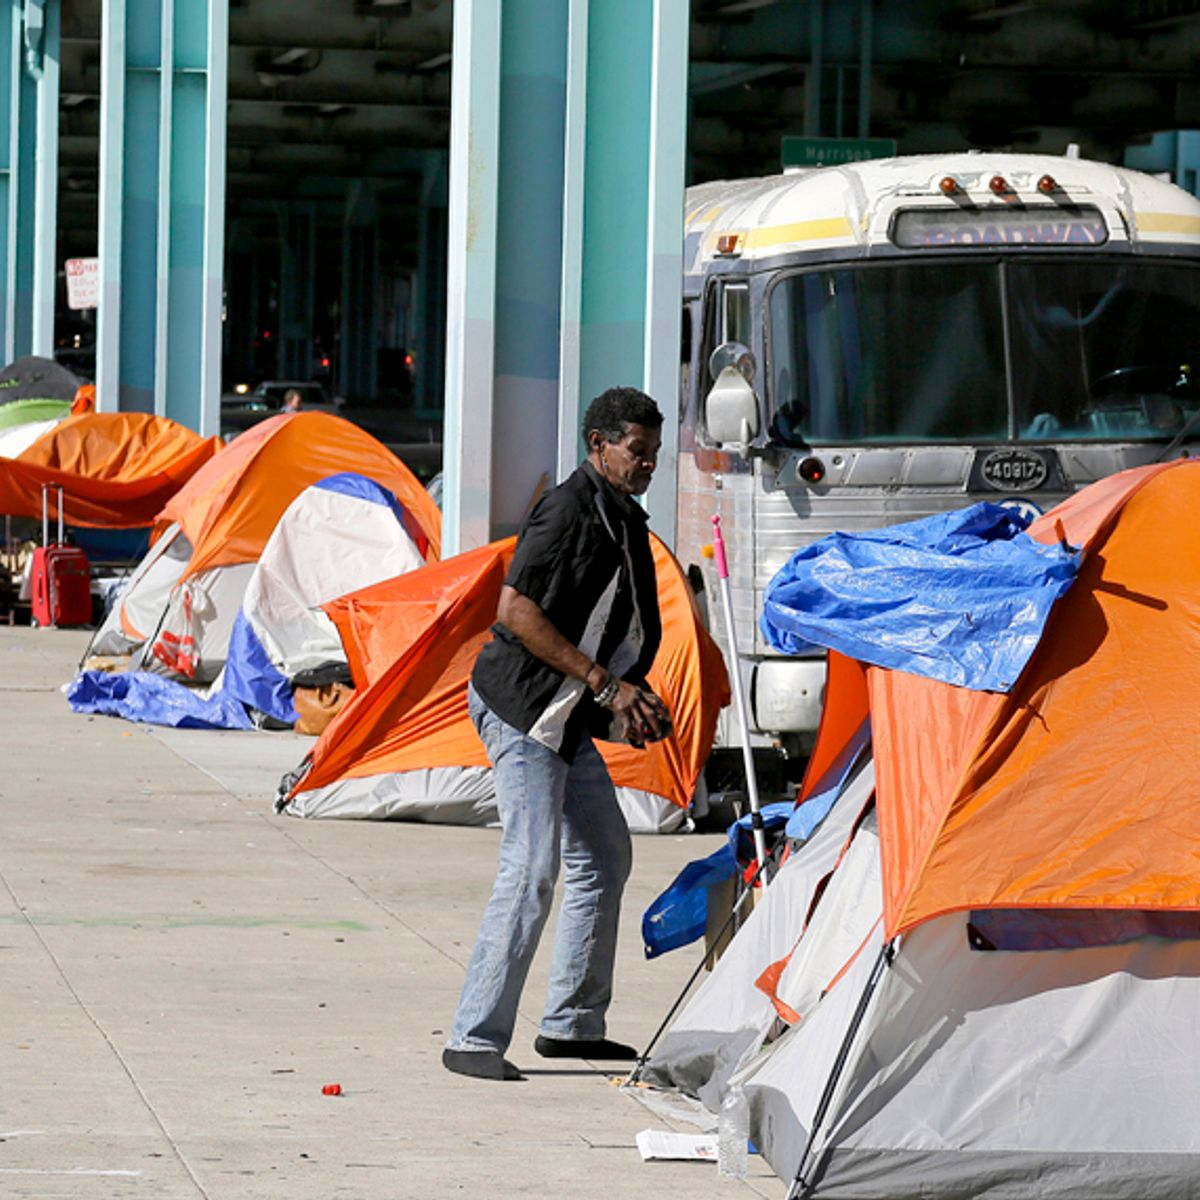 Despite thorough debunking, neoliberal housing politics prevail in the Bay Area